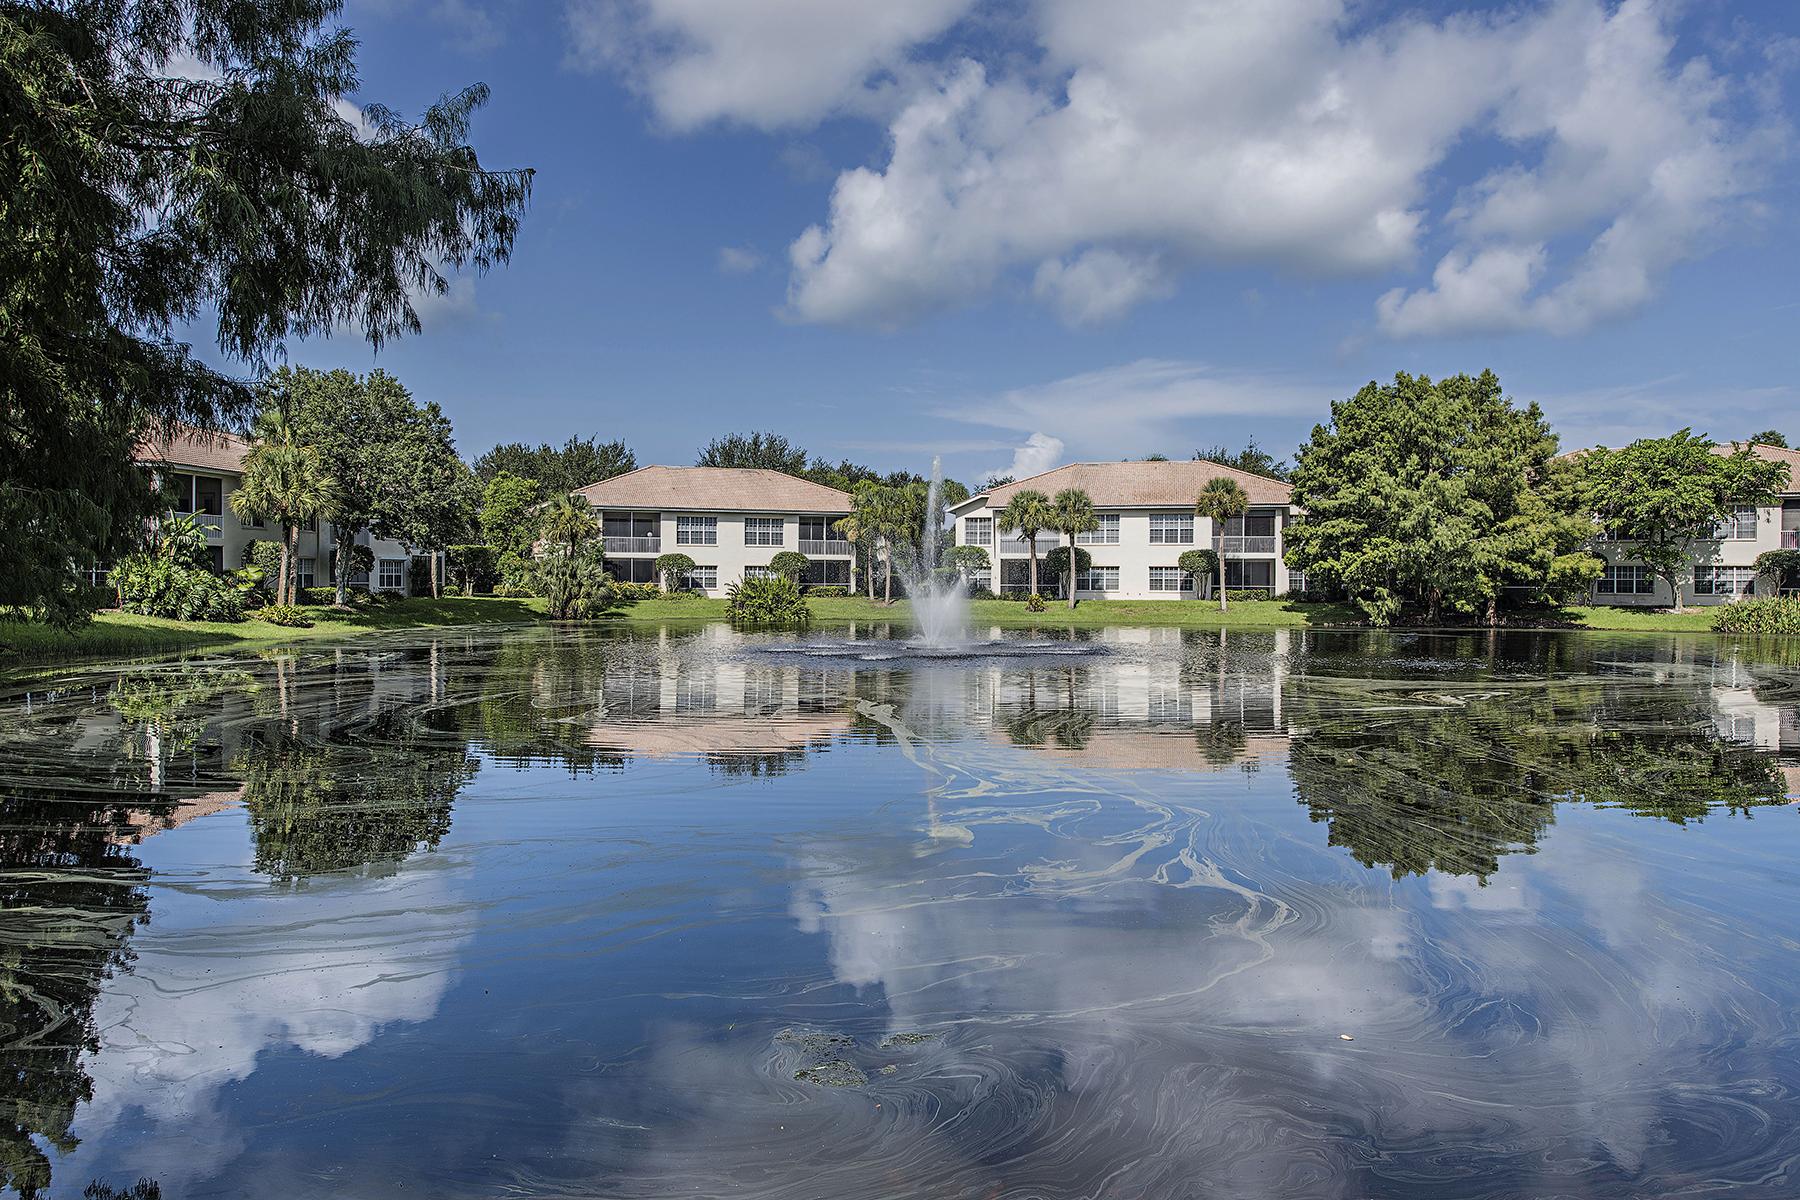 Condomínio para Venda às PELICAN MARSH - EGRETS WALK 1054 Egrets Walk Cir 102 Naples, Florida, 34108 Estados Unidos